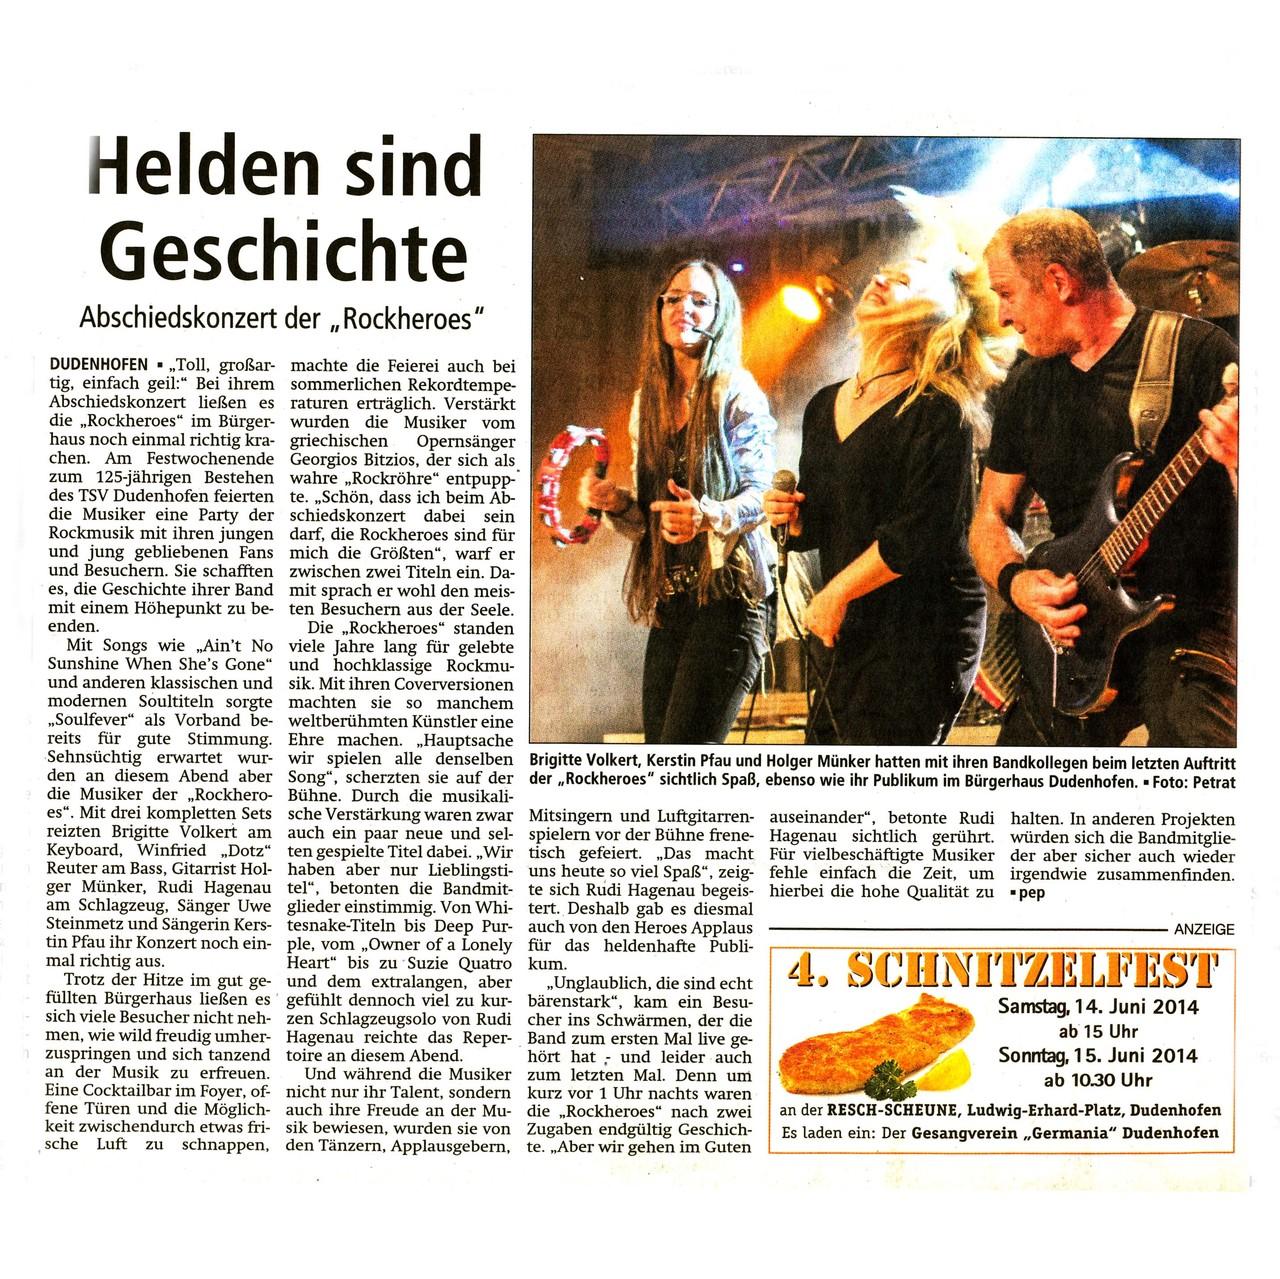 Offenbach Post, 11. Juni 2014